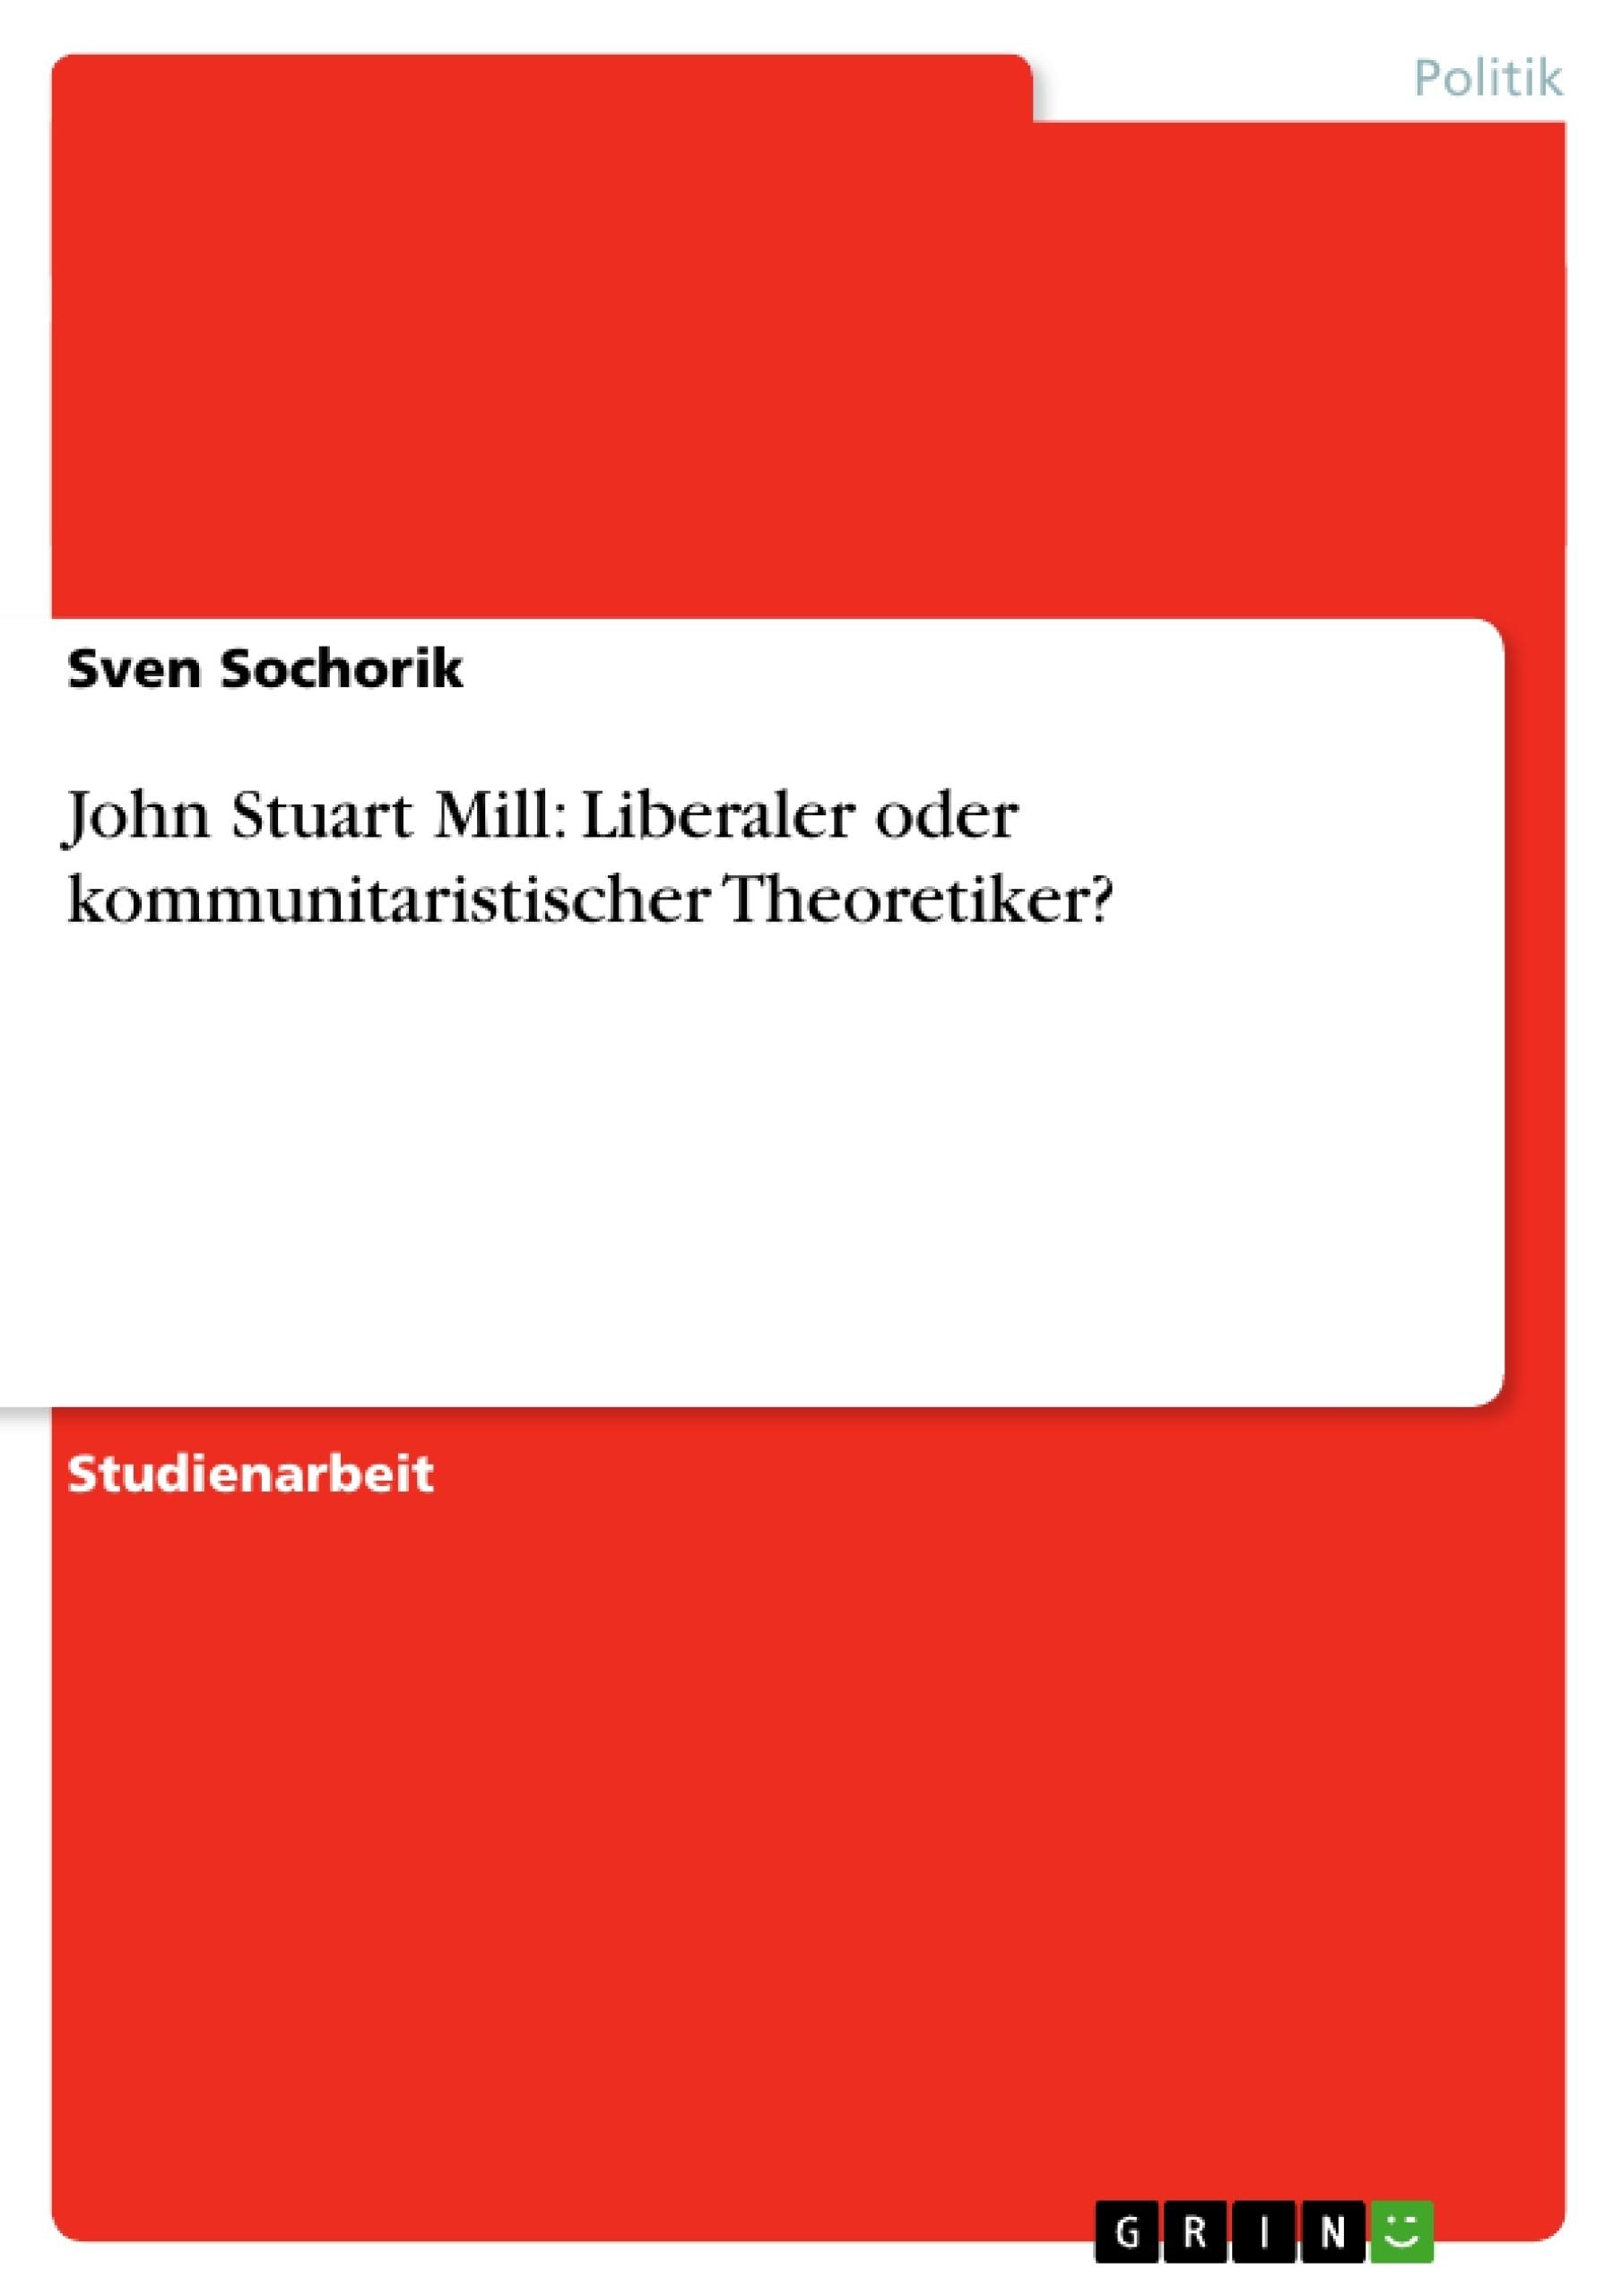 Titel: John Stuart Mill: Liberaler oder kommunitaristischer Theoretiker?